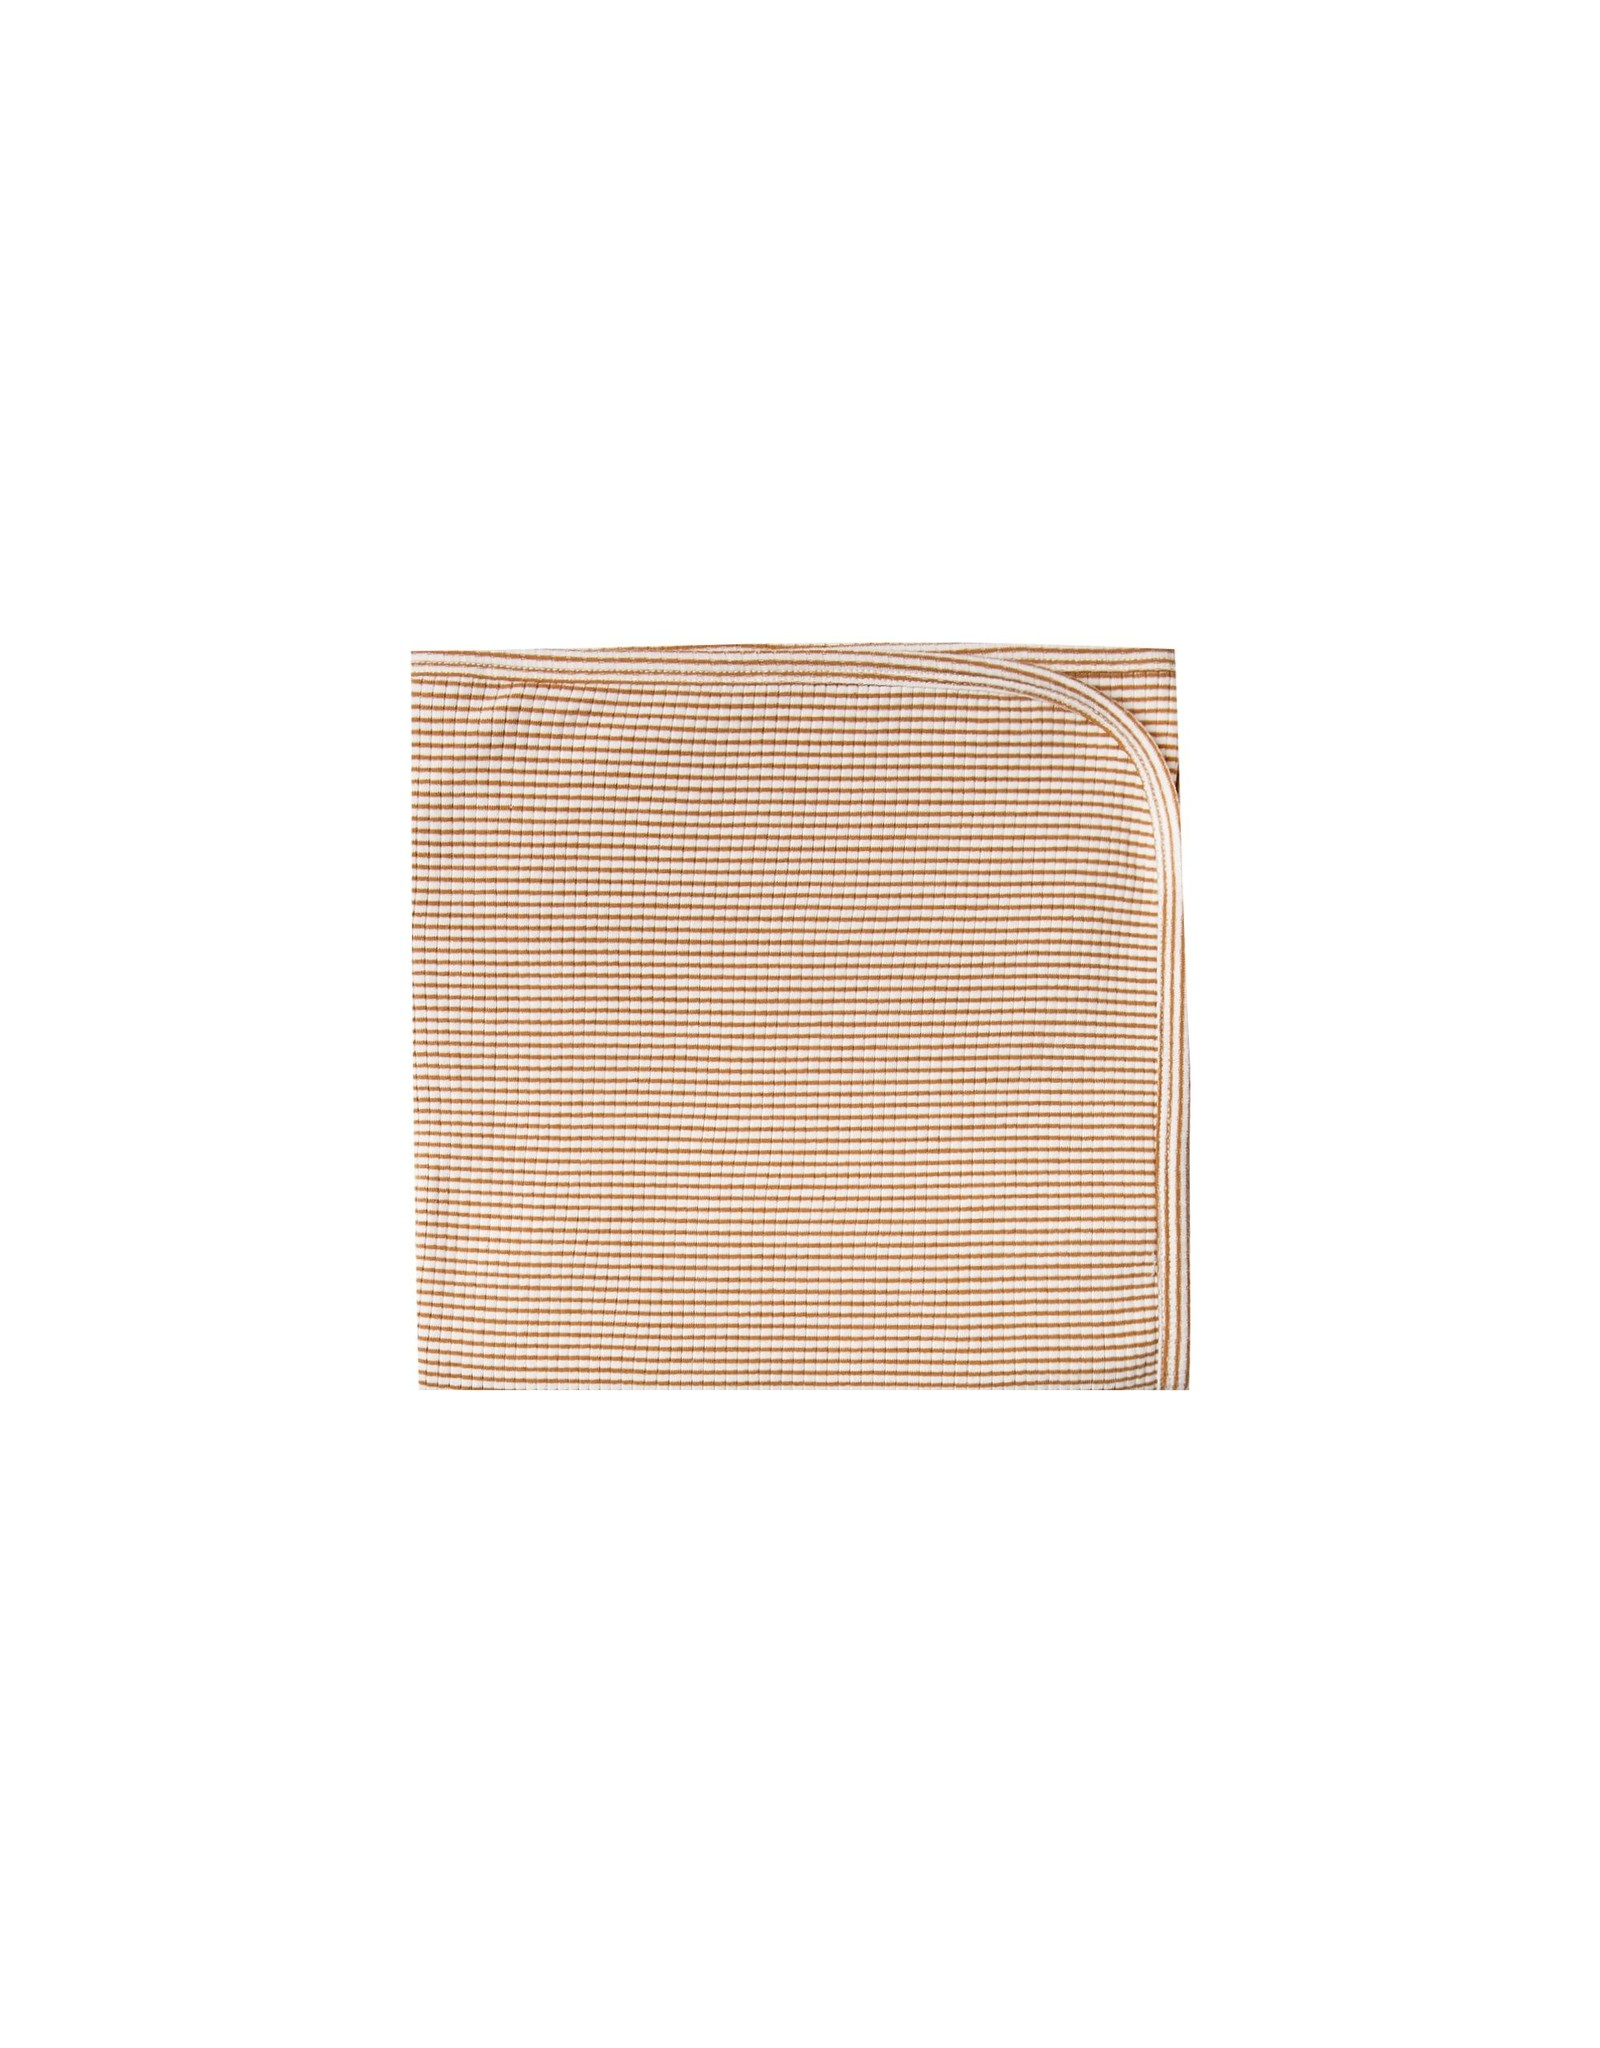 Quincy Mae Stripe Ribbed Blanket Walnut & Grey